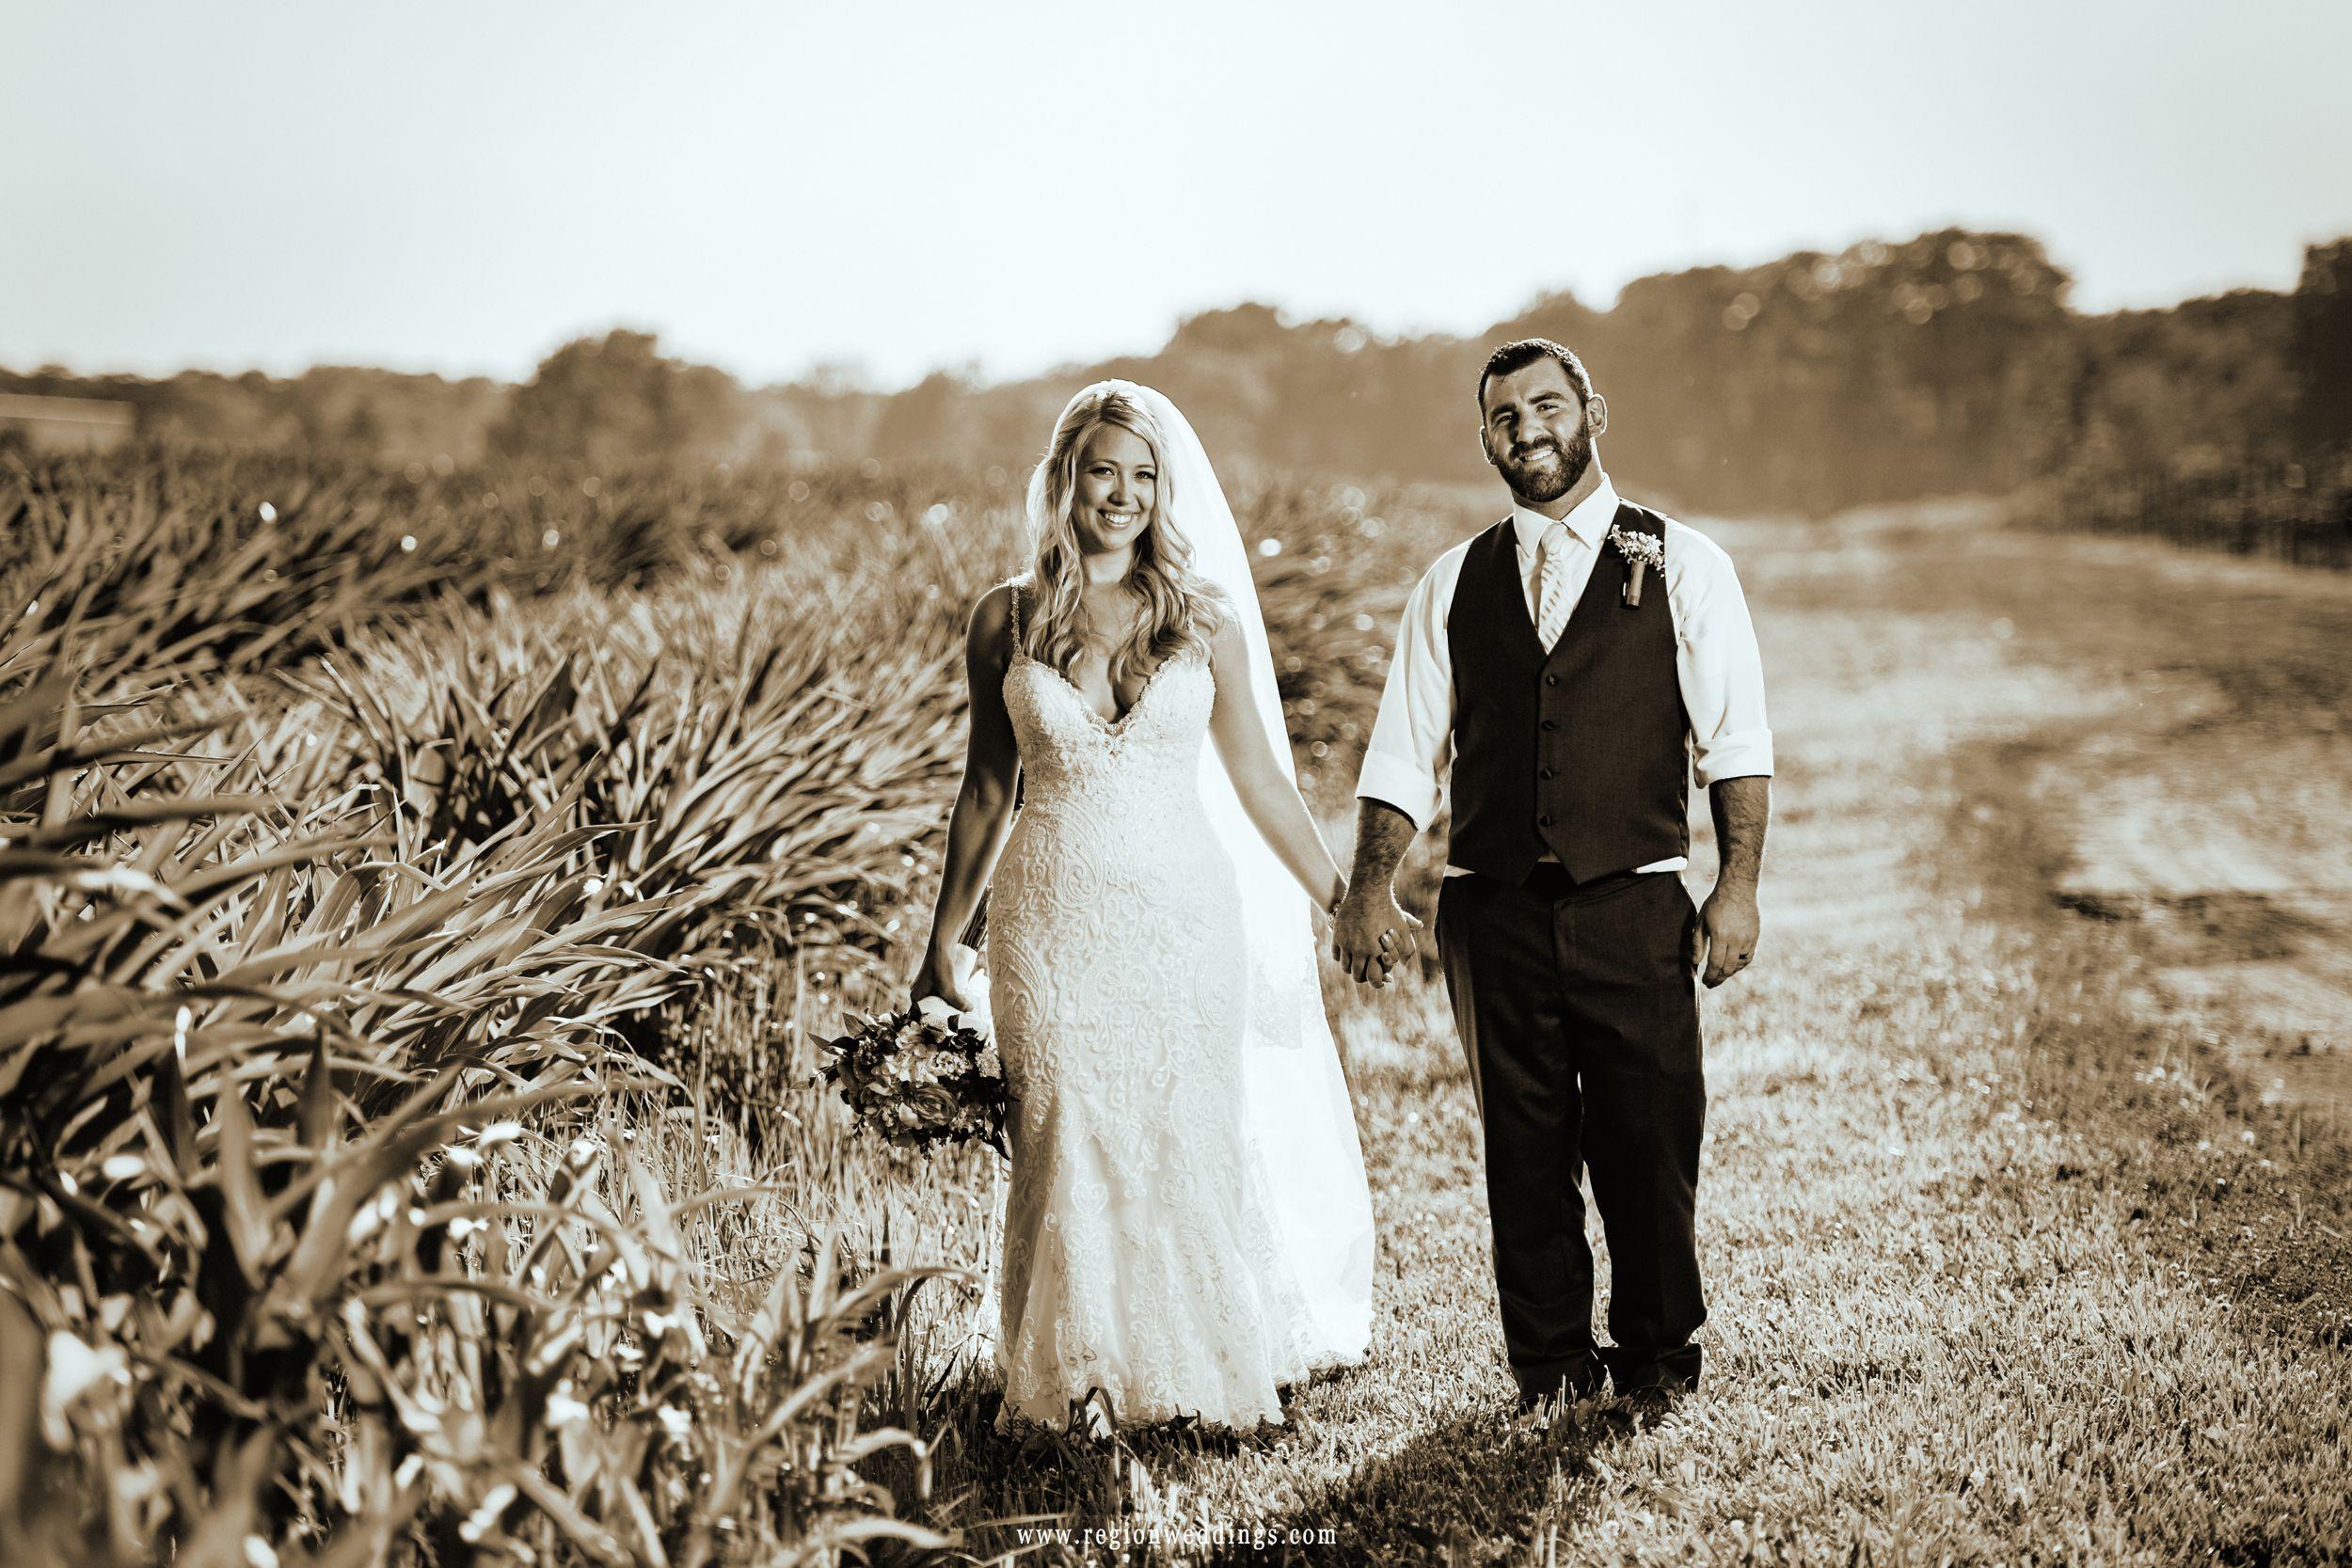 June wedding at county line orchard june wedding barn